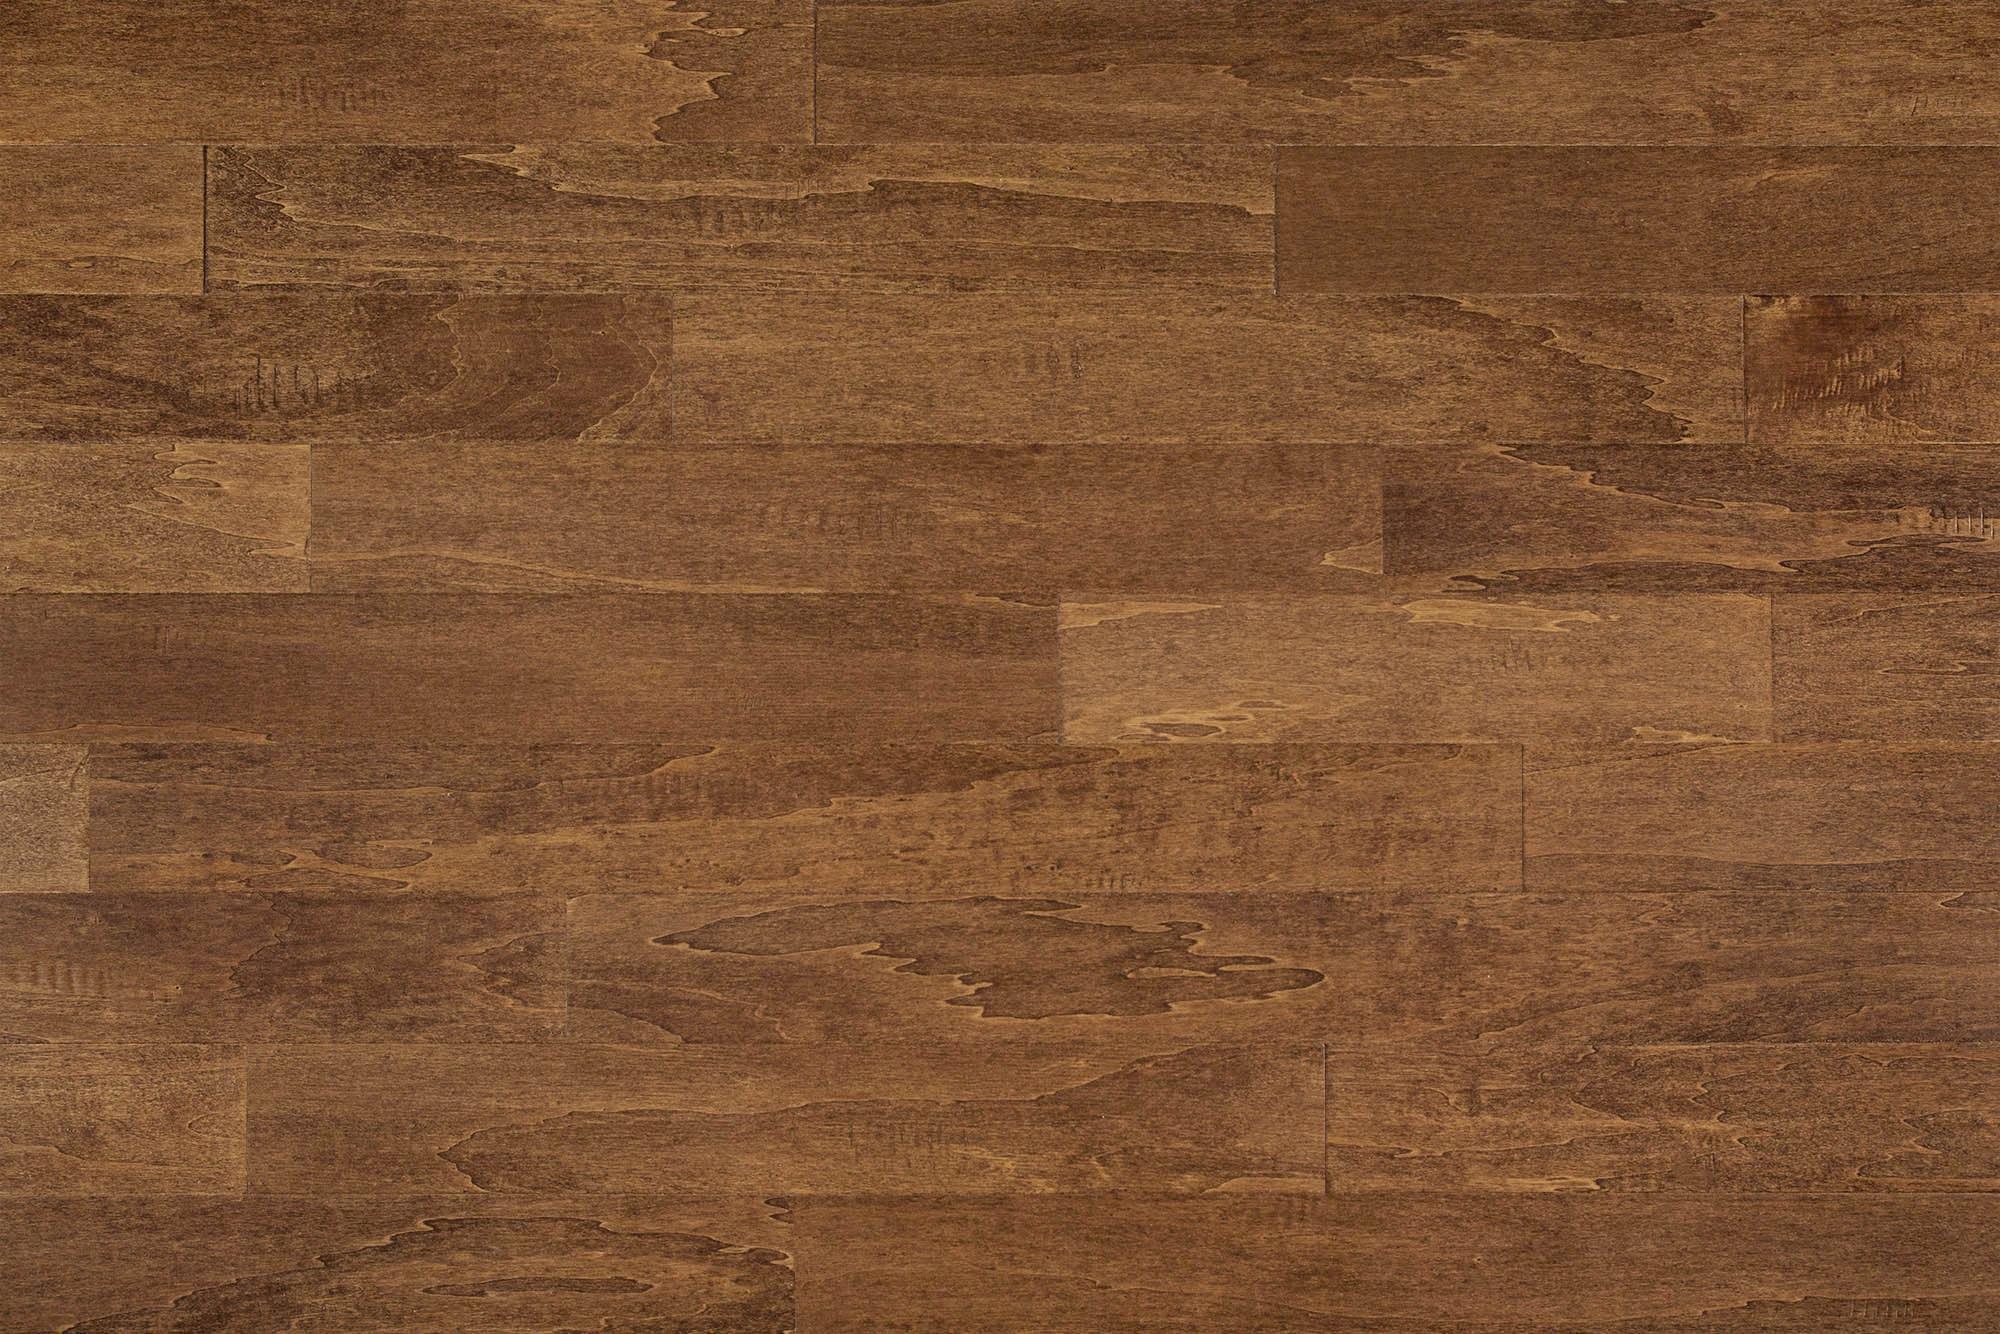 Chestnut / Birch / Handscraped / 4 7/8 x 3/8 Engineered Hardwood - Birch Cosmopolitan Trendy Collection 0